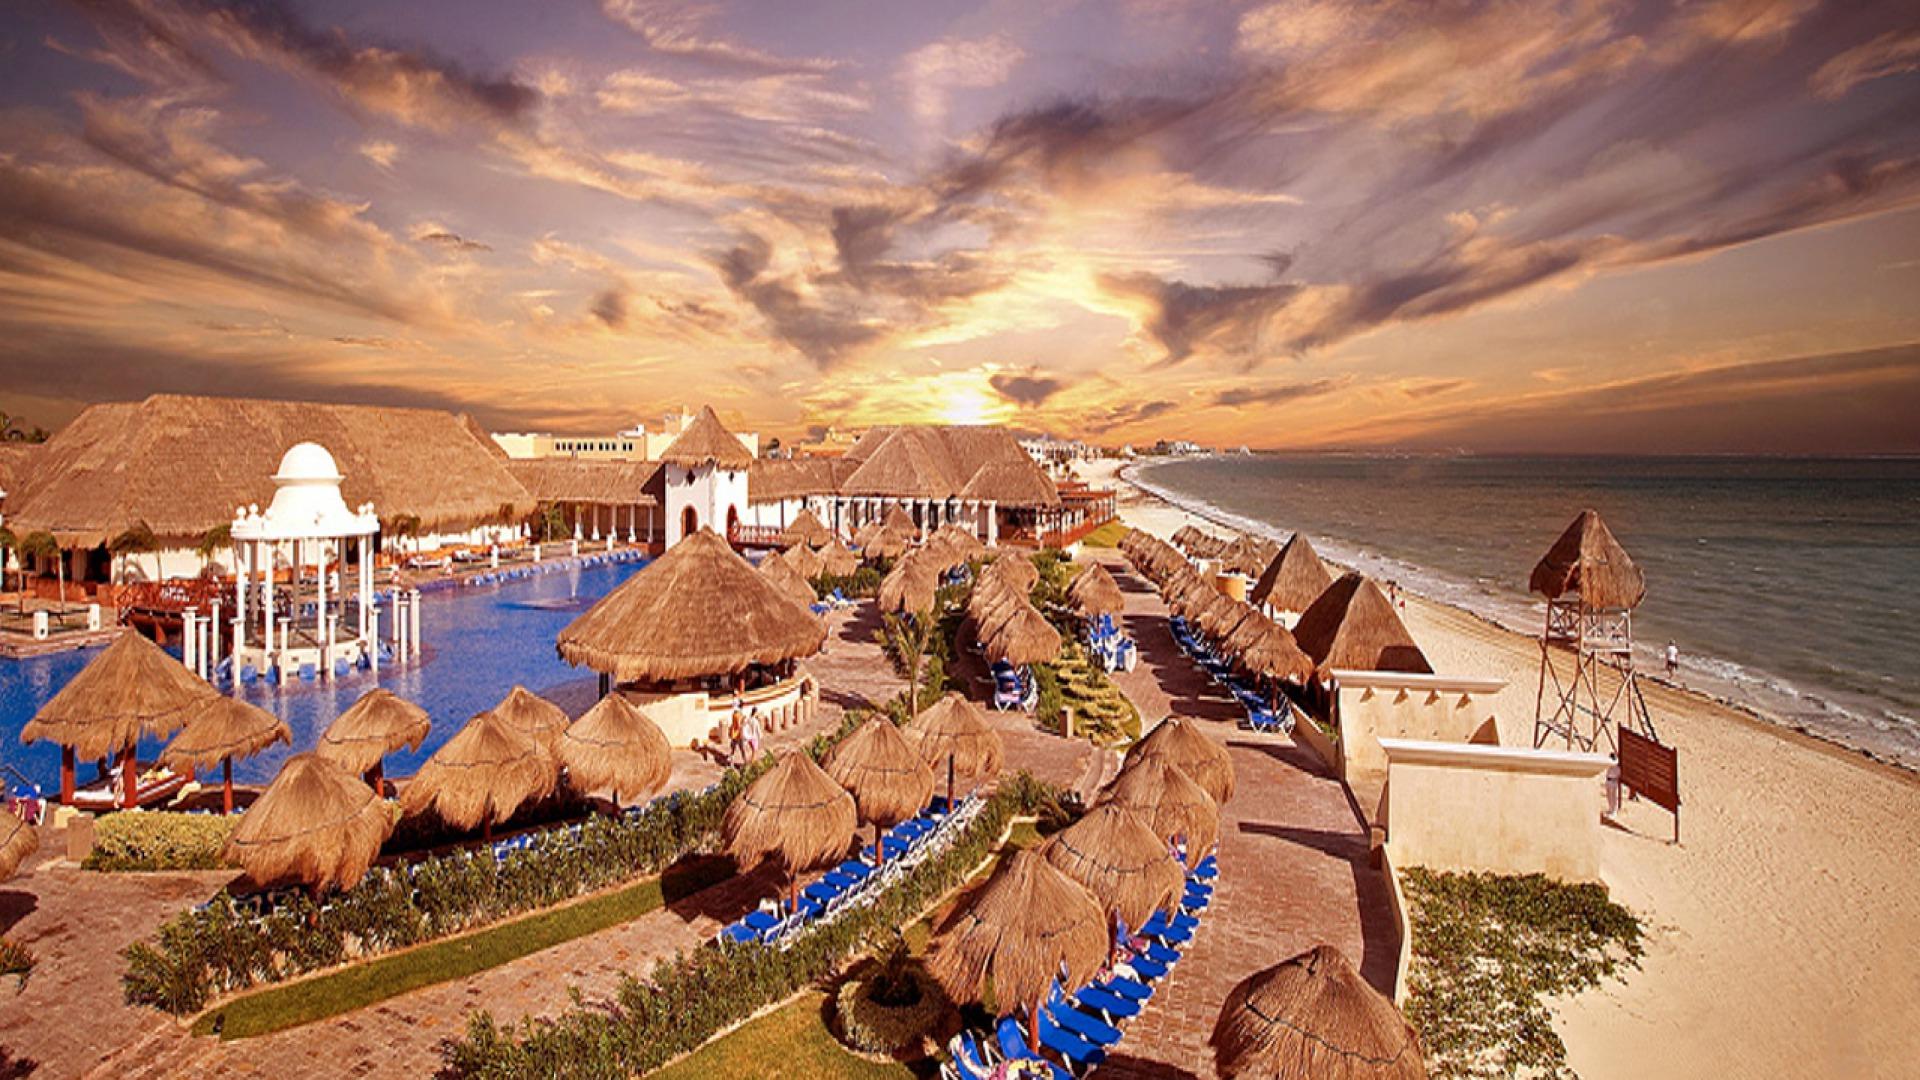 Wallpaper Hd De Cancun: Cancun Full HD Wallpaper And Background Image